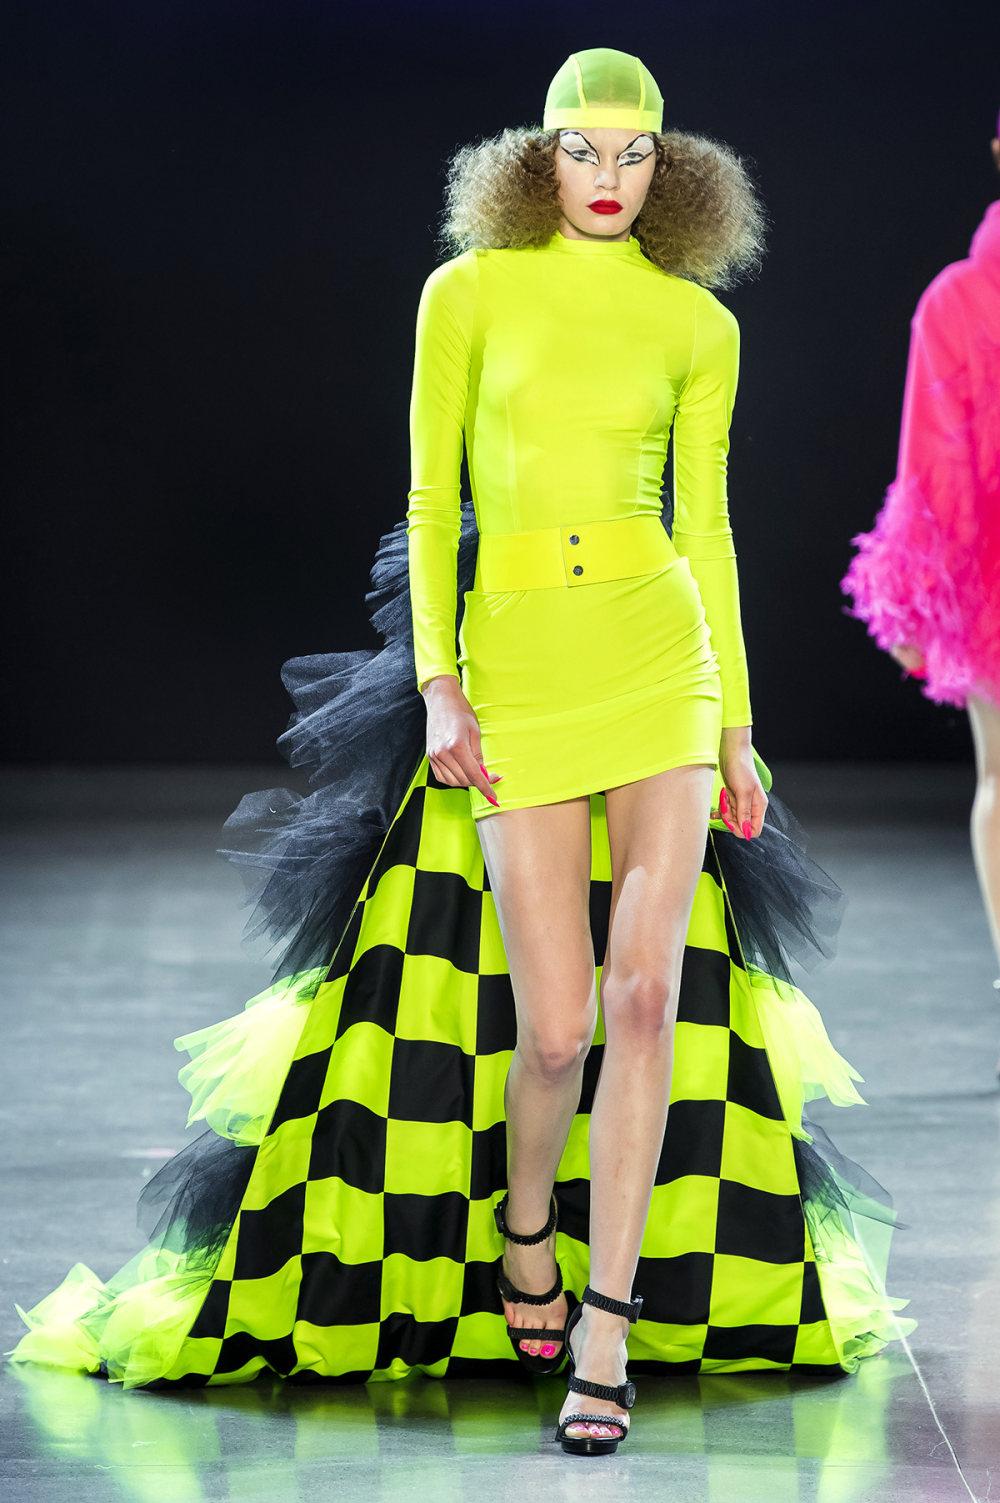 Christian Cowan时装系列虽然巨大的薄纱层状服装并没有那么特别-17.jpg